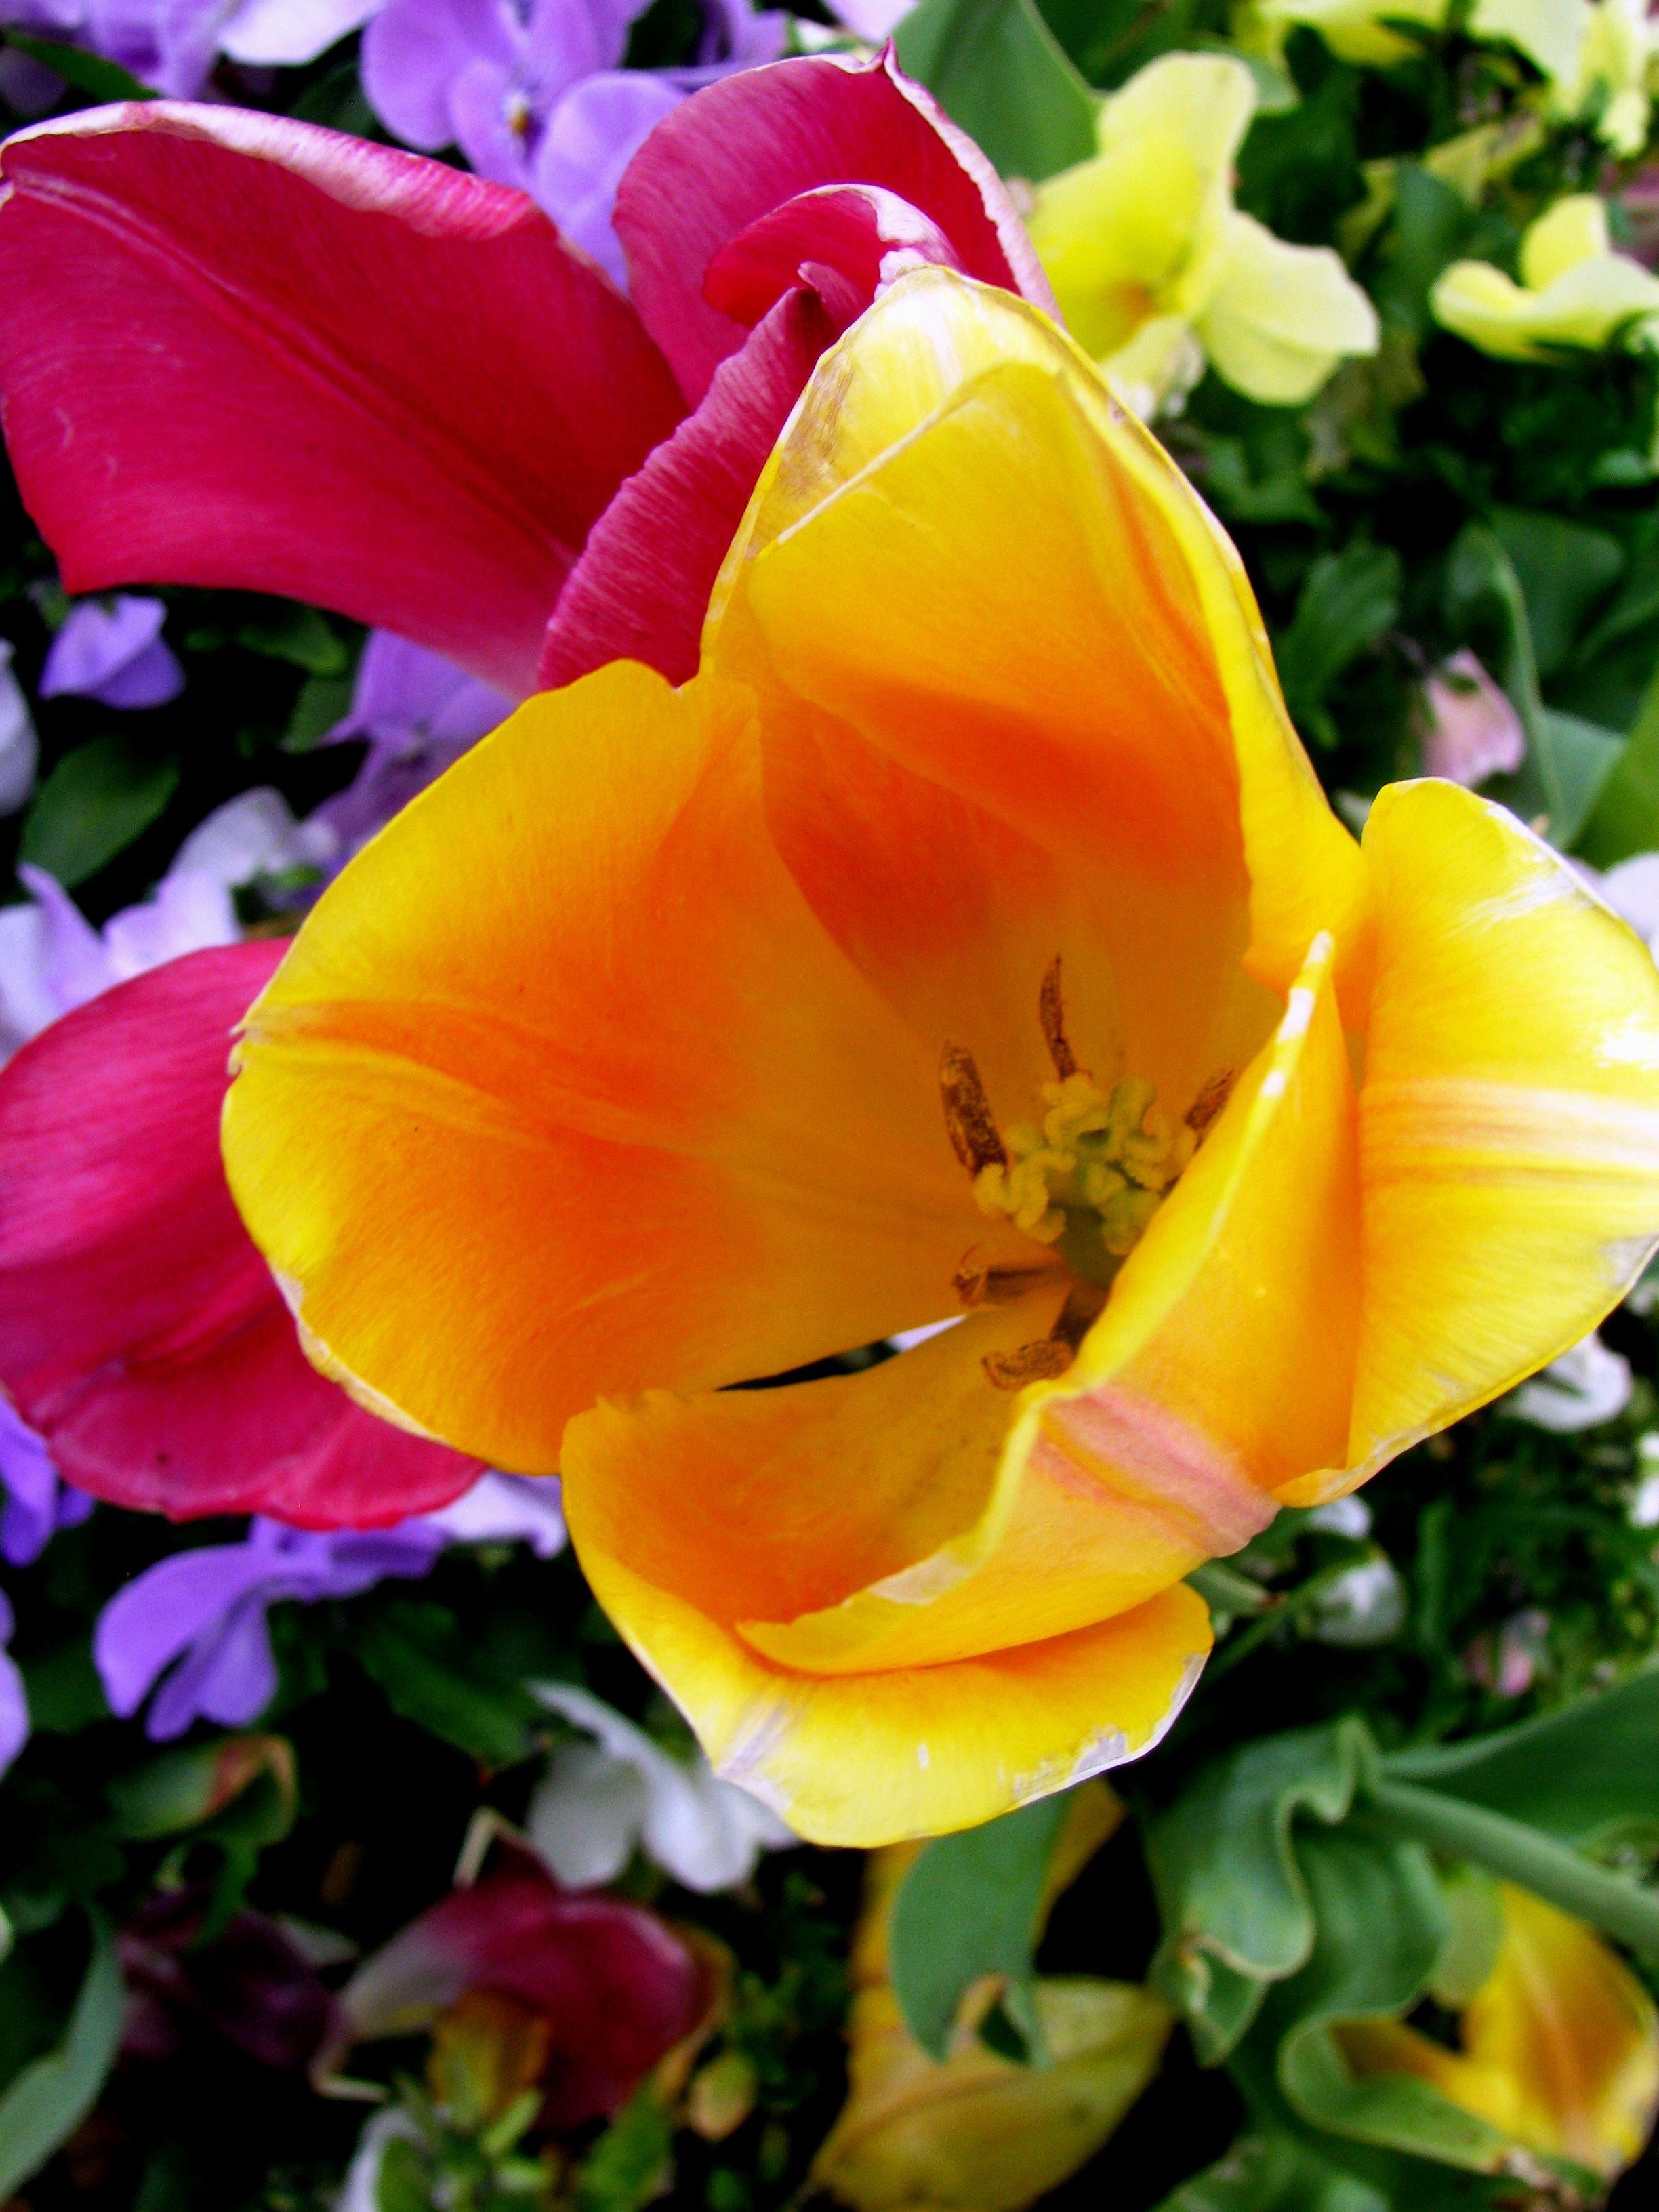 Enchanting Flowers Yellow Orange And Pink Tulips Enchanting